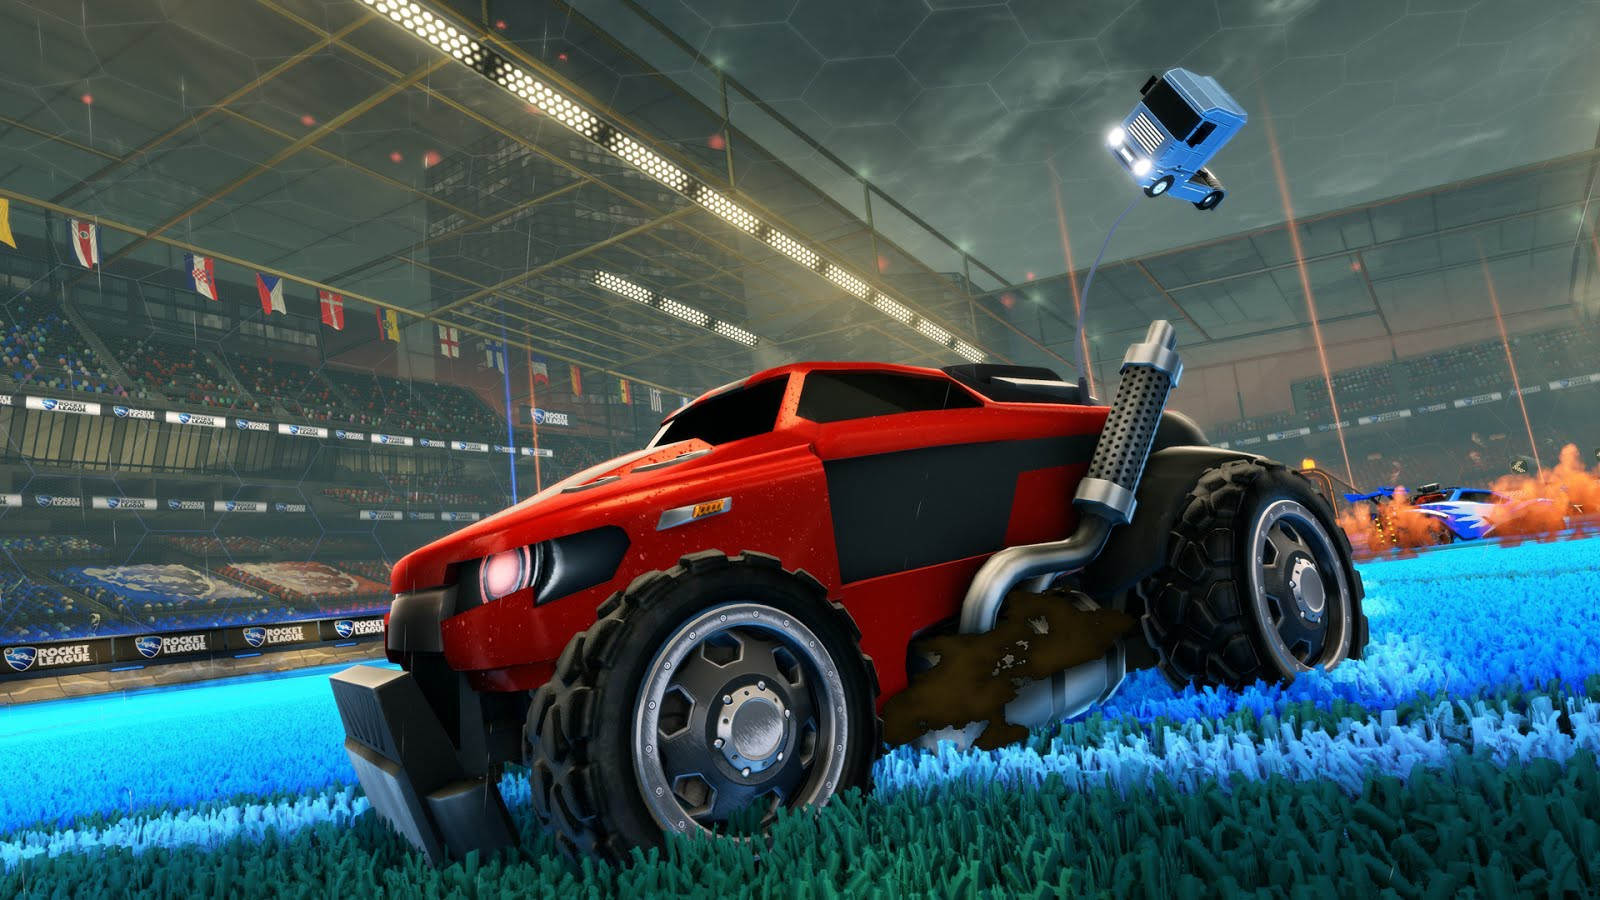 Spolupráce mezi hrami Rocket League a Euro Truck Simulator 2 122667